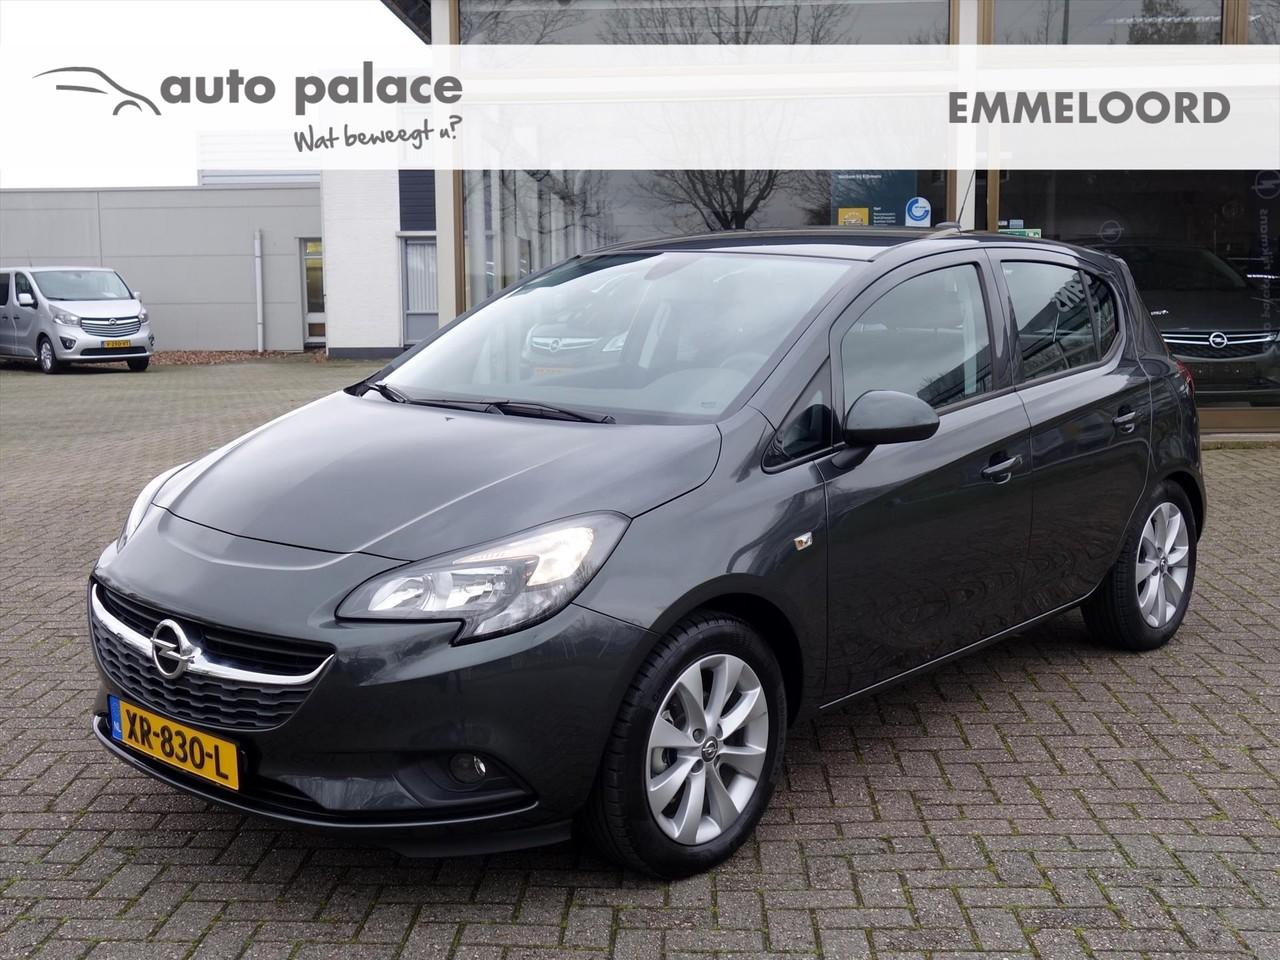 Opel Corsa 1.4-16v 90pk 5drs favourite+ airco navigatie dab+ parkpilot lmv